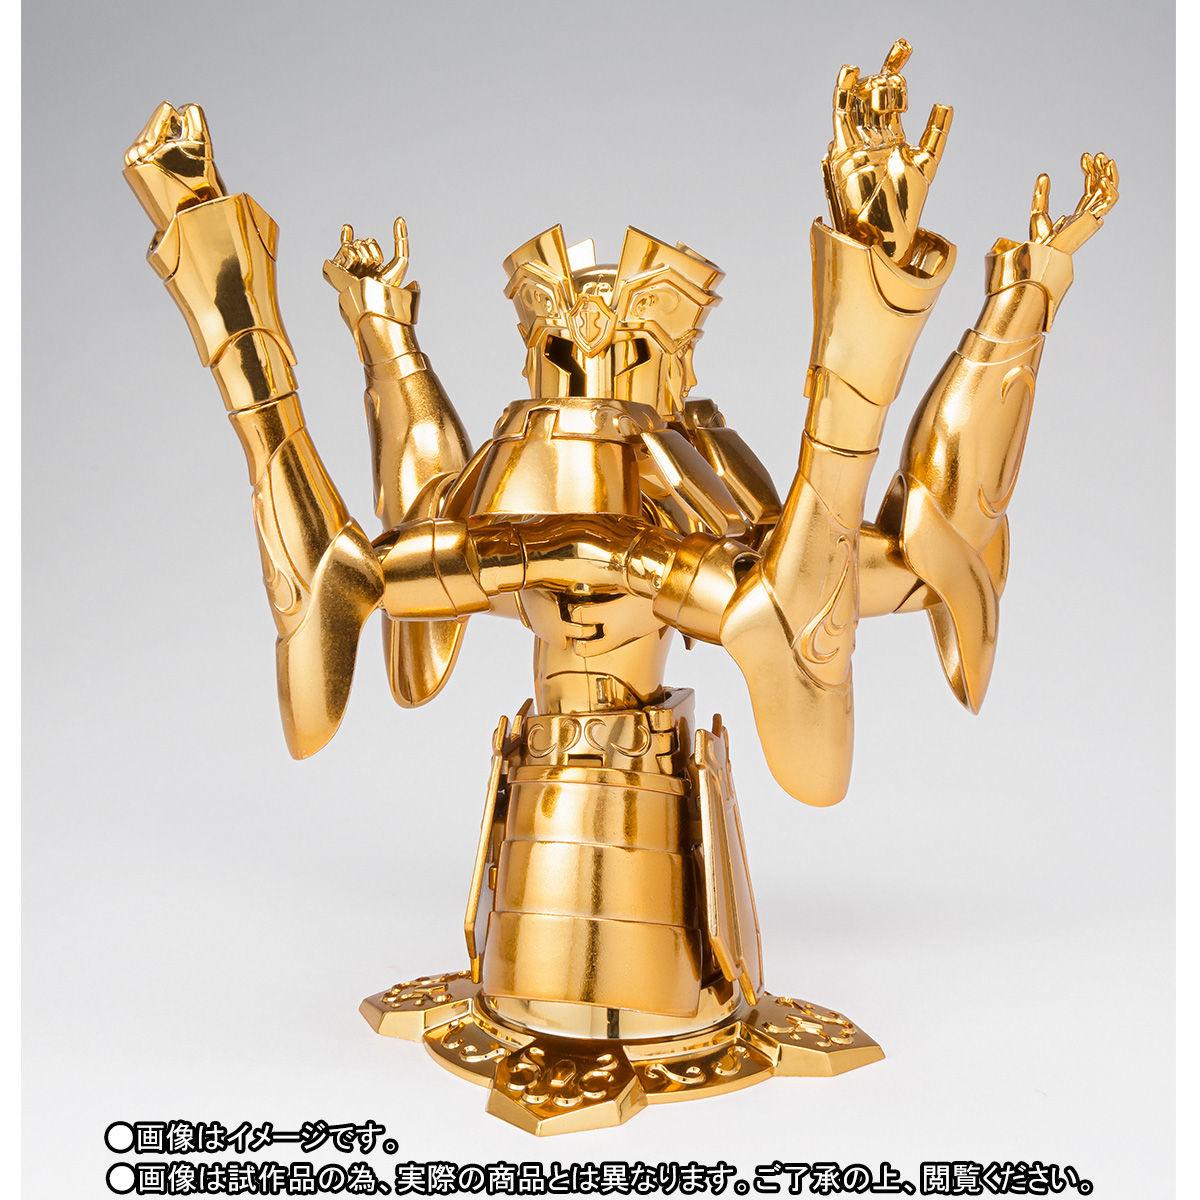 ROBOT魂 〈SIDE MS〉『RX-78-2 ガンダム & Gファイター ver. A.N.I.M.E.~リアルタイプカラー~』可動フィギュア-017